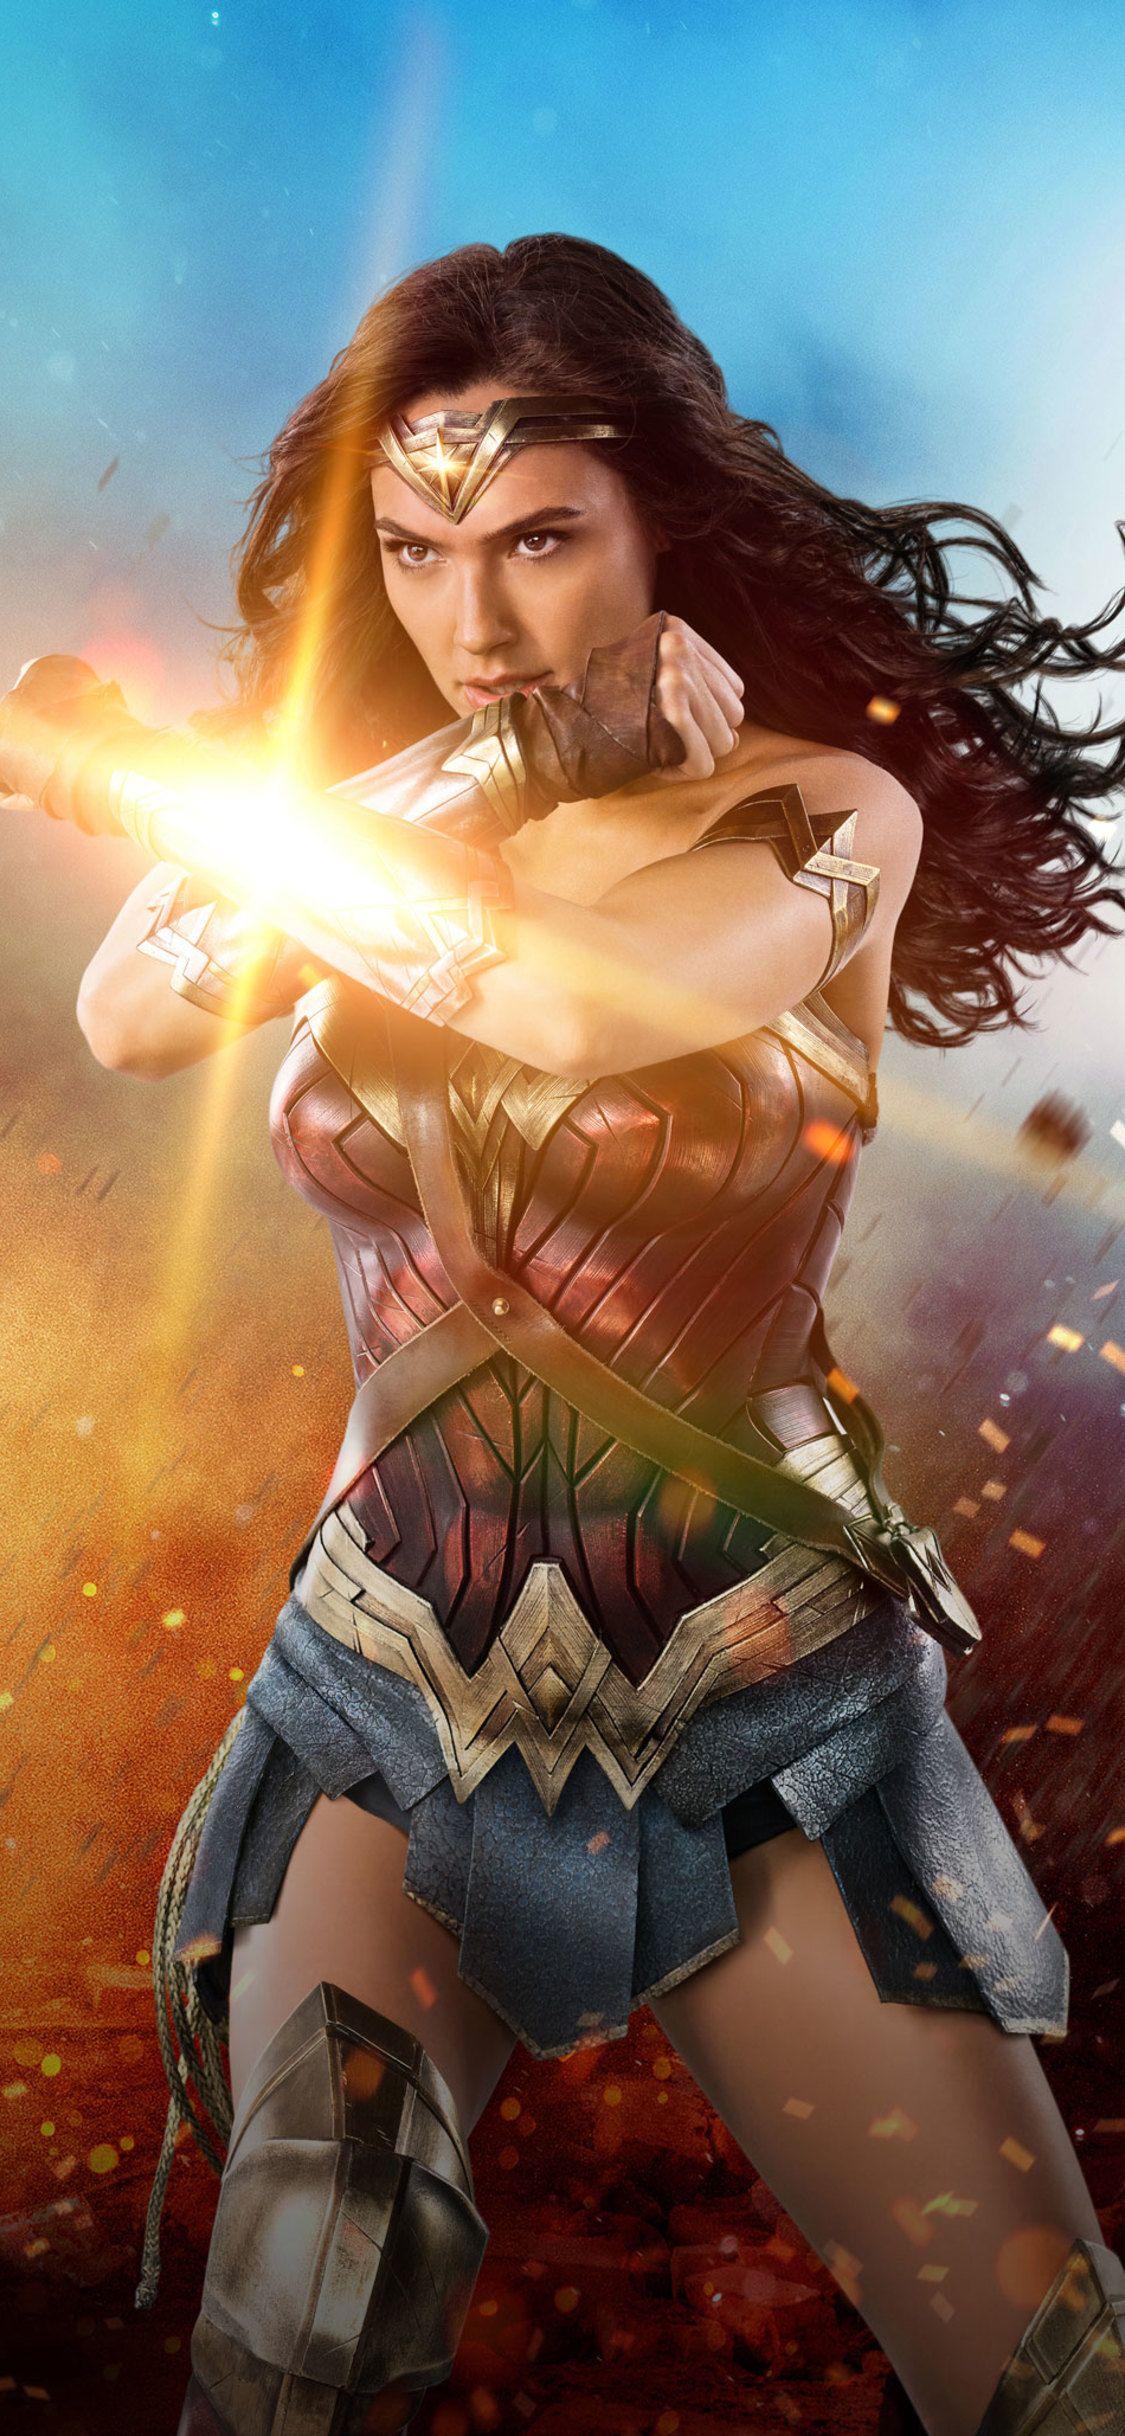 1125x2436 2017 Wonder Woman 4k Iphone Xs Iphone 10 Iphone X Hd 4k Wallpapers Images Backgroun Wonder Woman Pictures Wonder Woman Movie Gal Gadot Wonder Woman